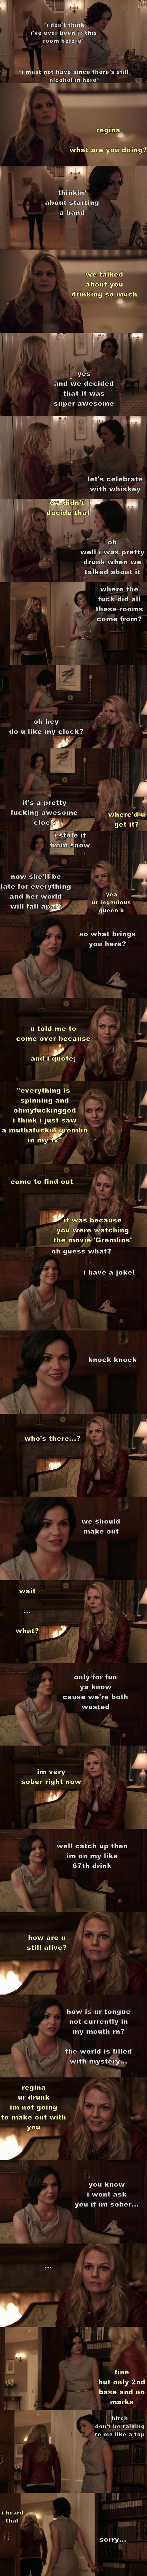 Drunk!Regina.  Wait...What?  (by thelast-thingido.tumblr)